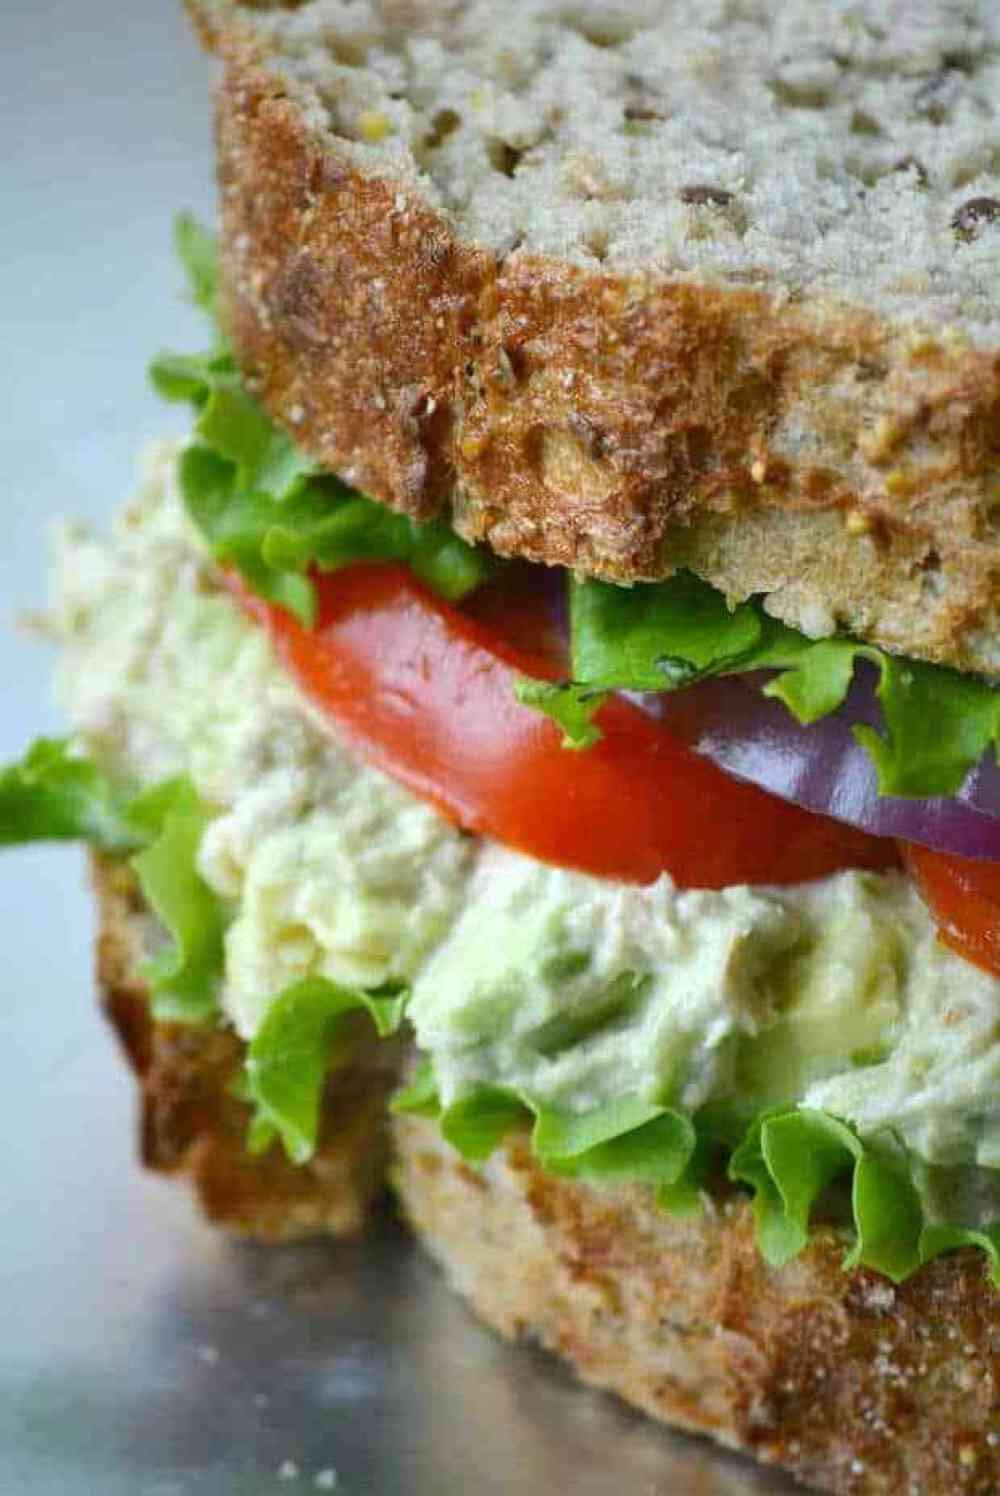 Tuna Sandwiches Healthy  Heart Healthy Tuna Avocado Salad Sandwich